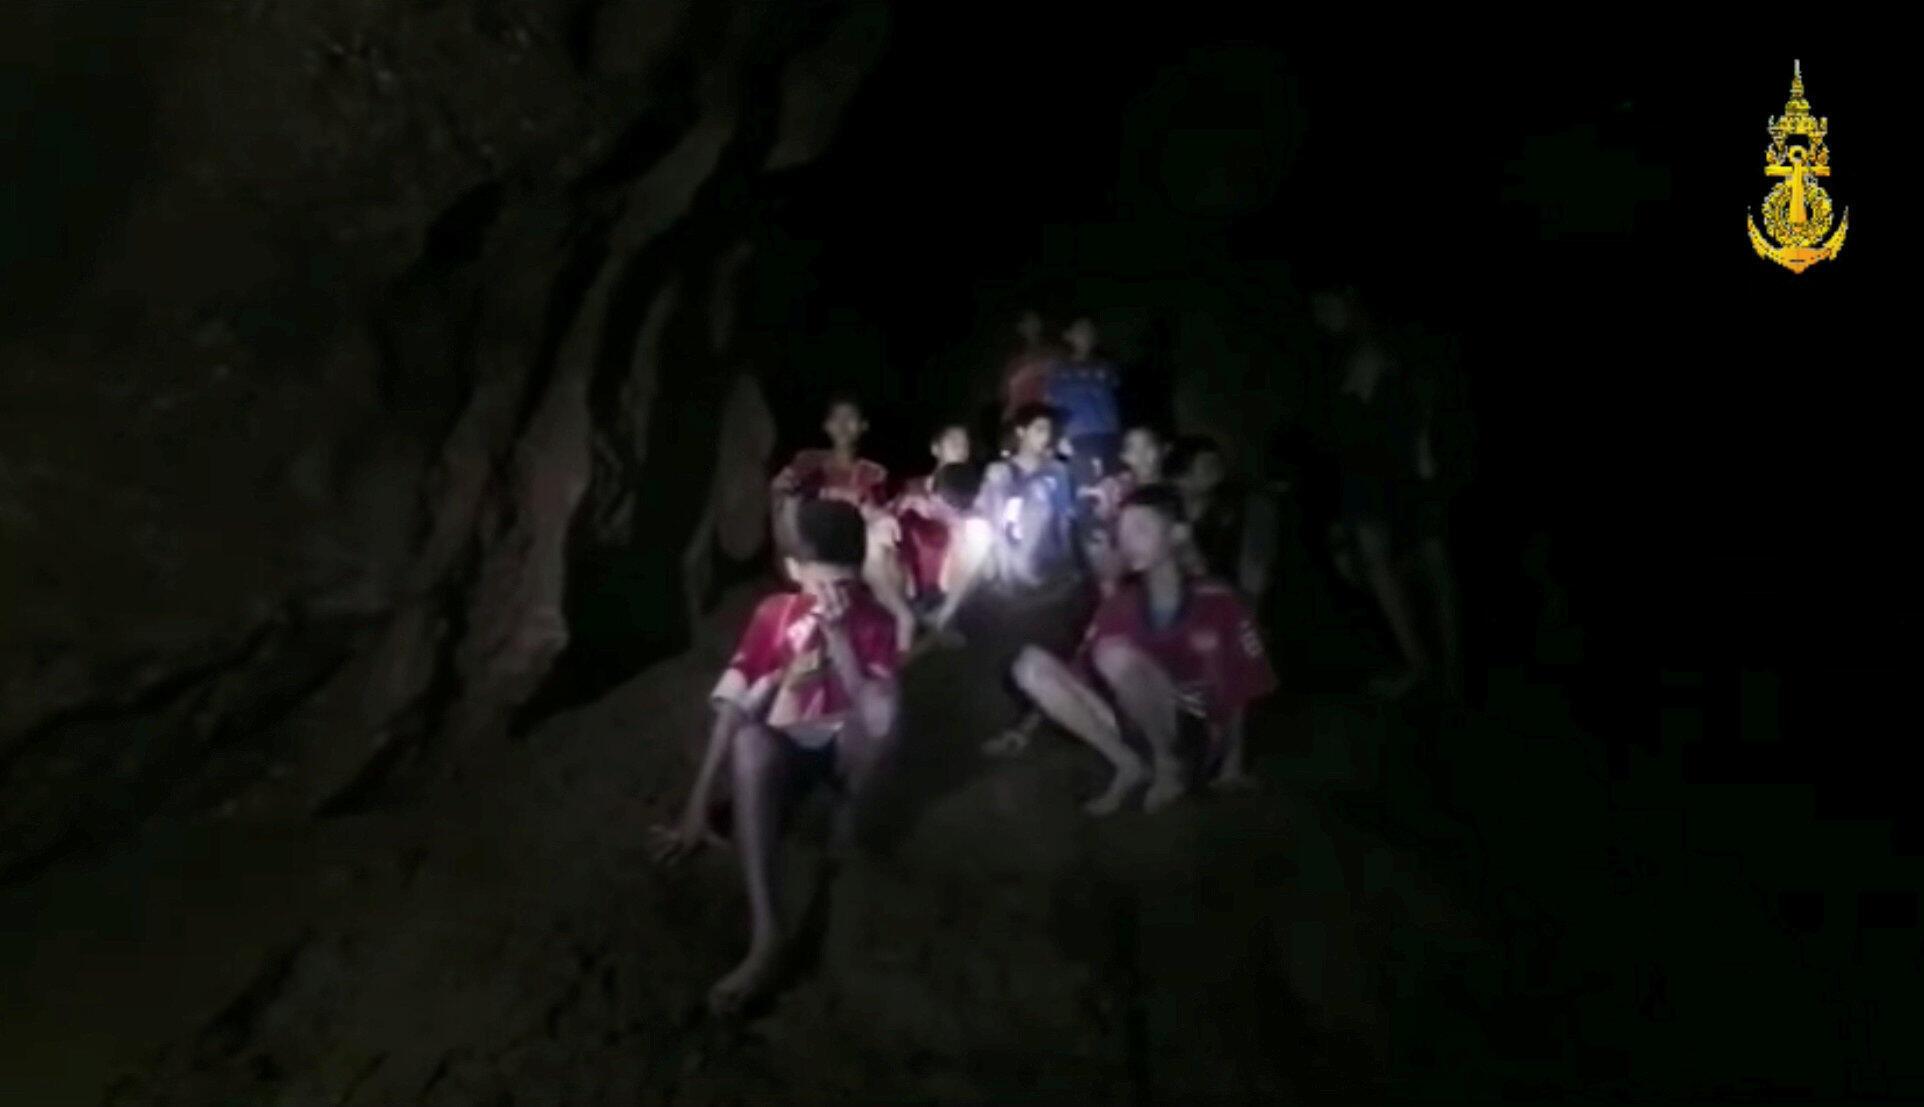 Wavulana 12 walio na umri ulio chini ya miaka 16 na kocha wao wanasubiri kuokolewa baada ya kukwama katika pango.inside a flooded cave in Chiang Rai, Thailand, July 3, 2018, in this still image taken from a Thai Navy Seal handout video.